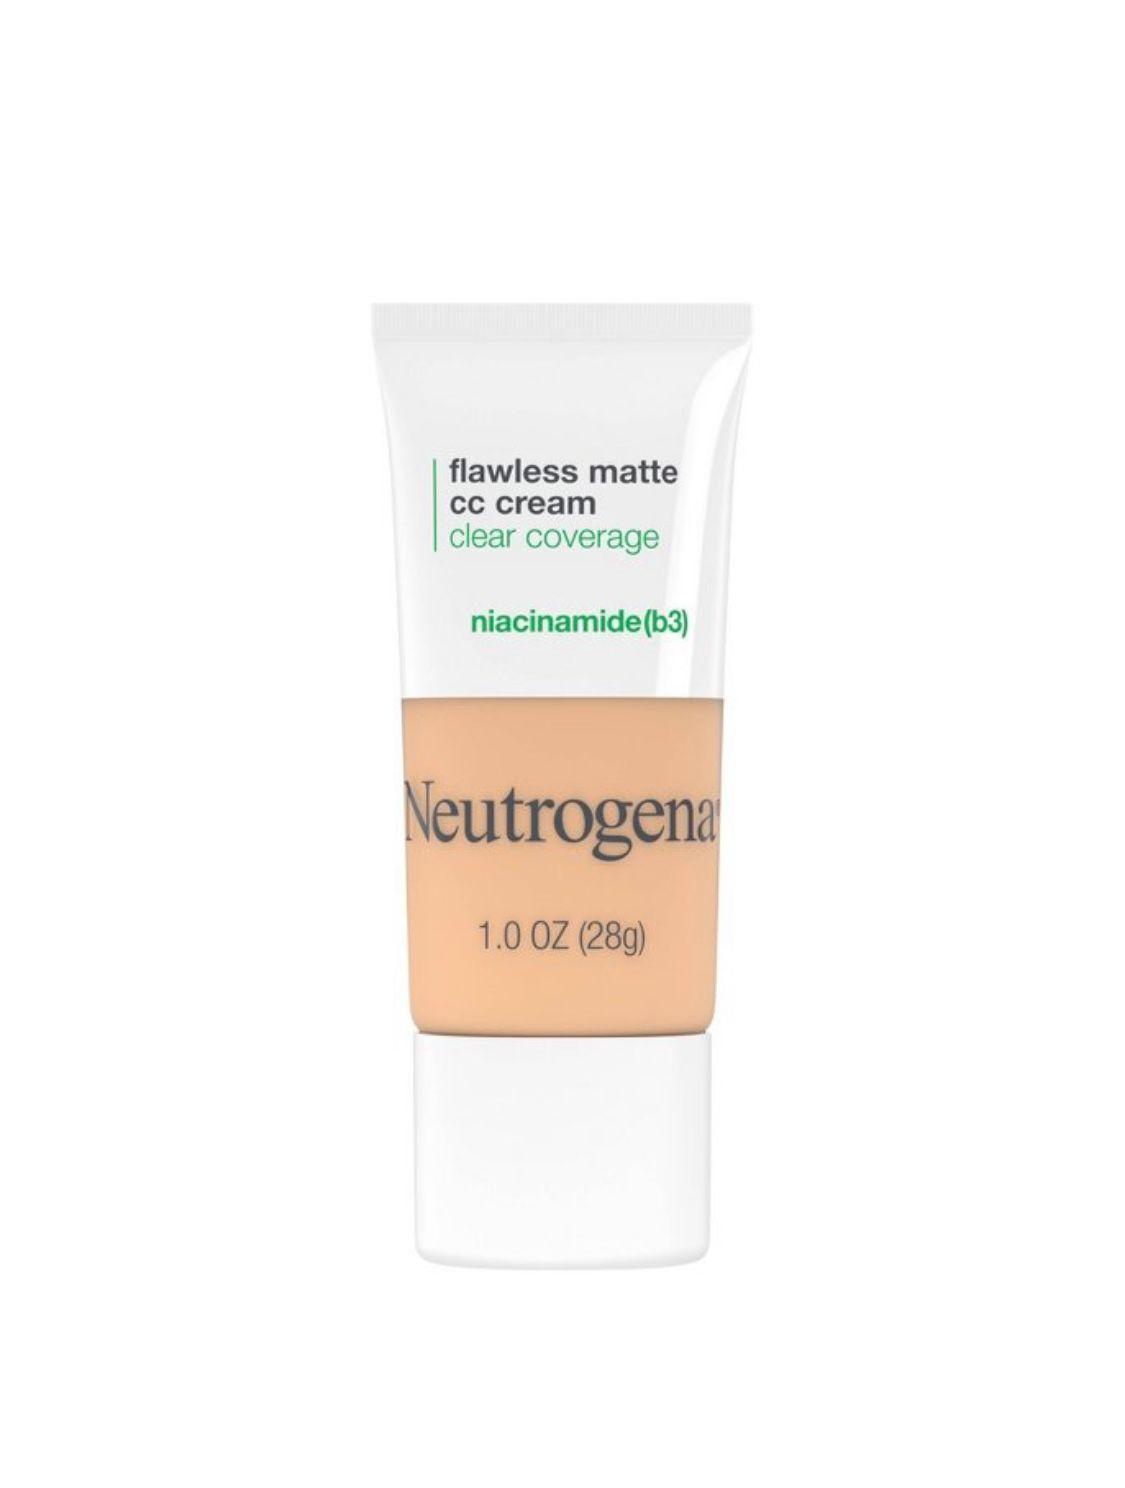 Flawless Matte CC Cream